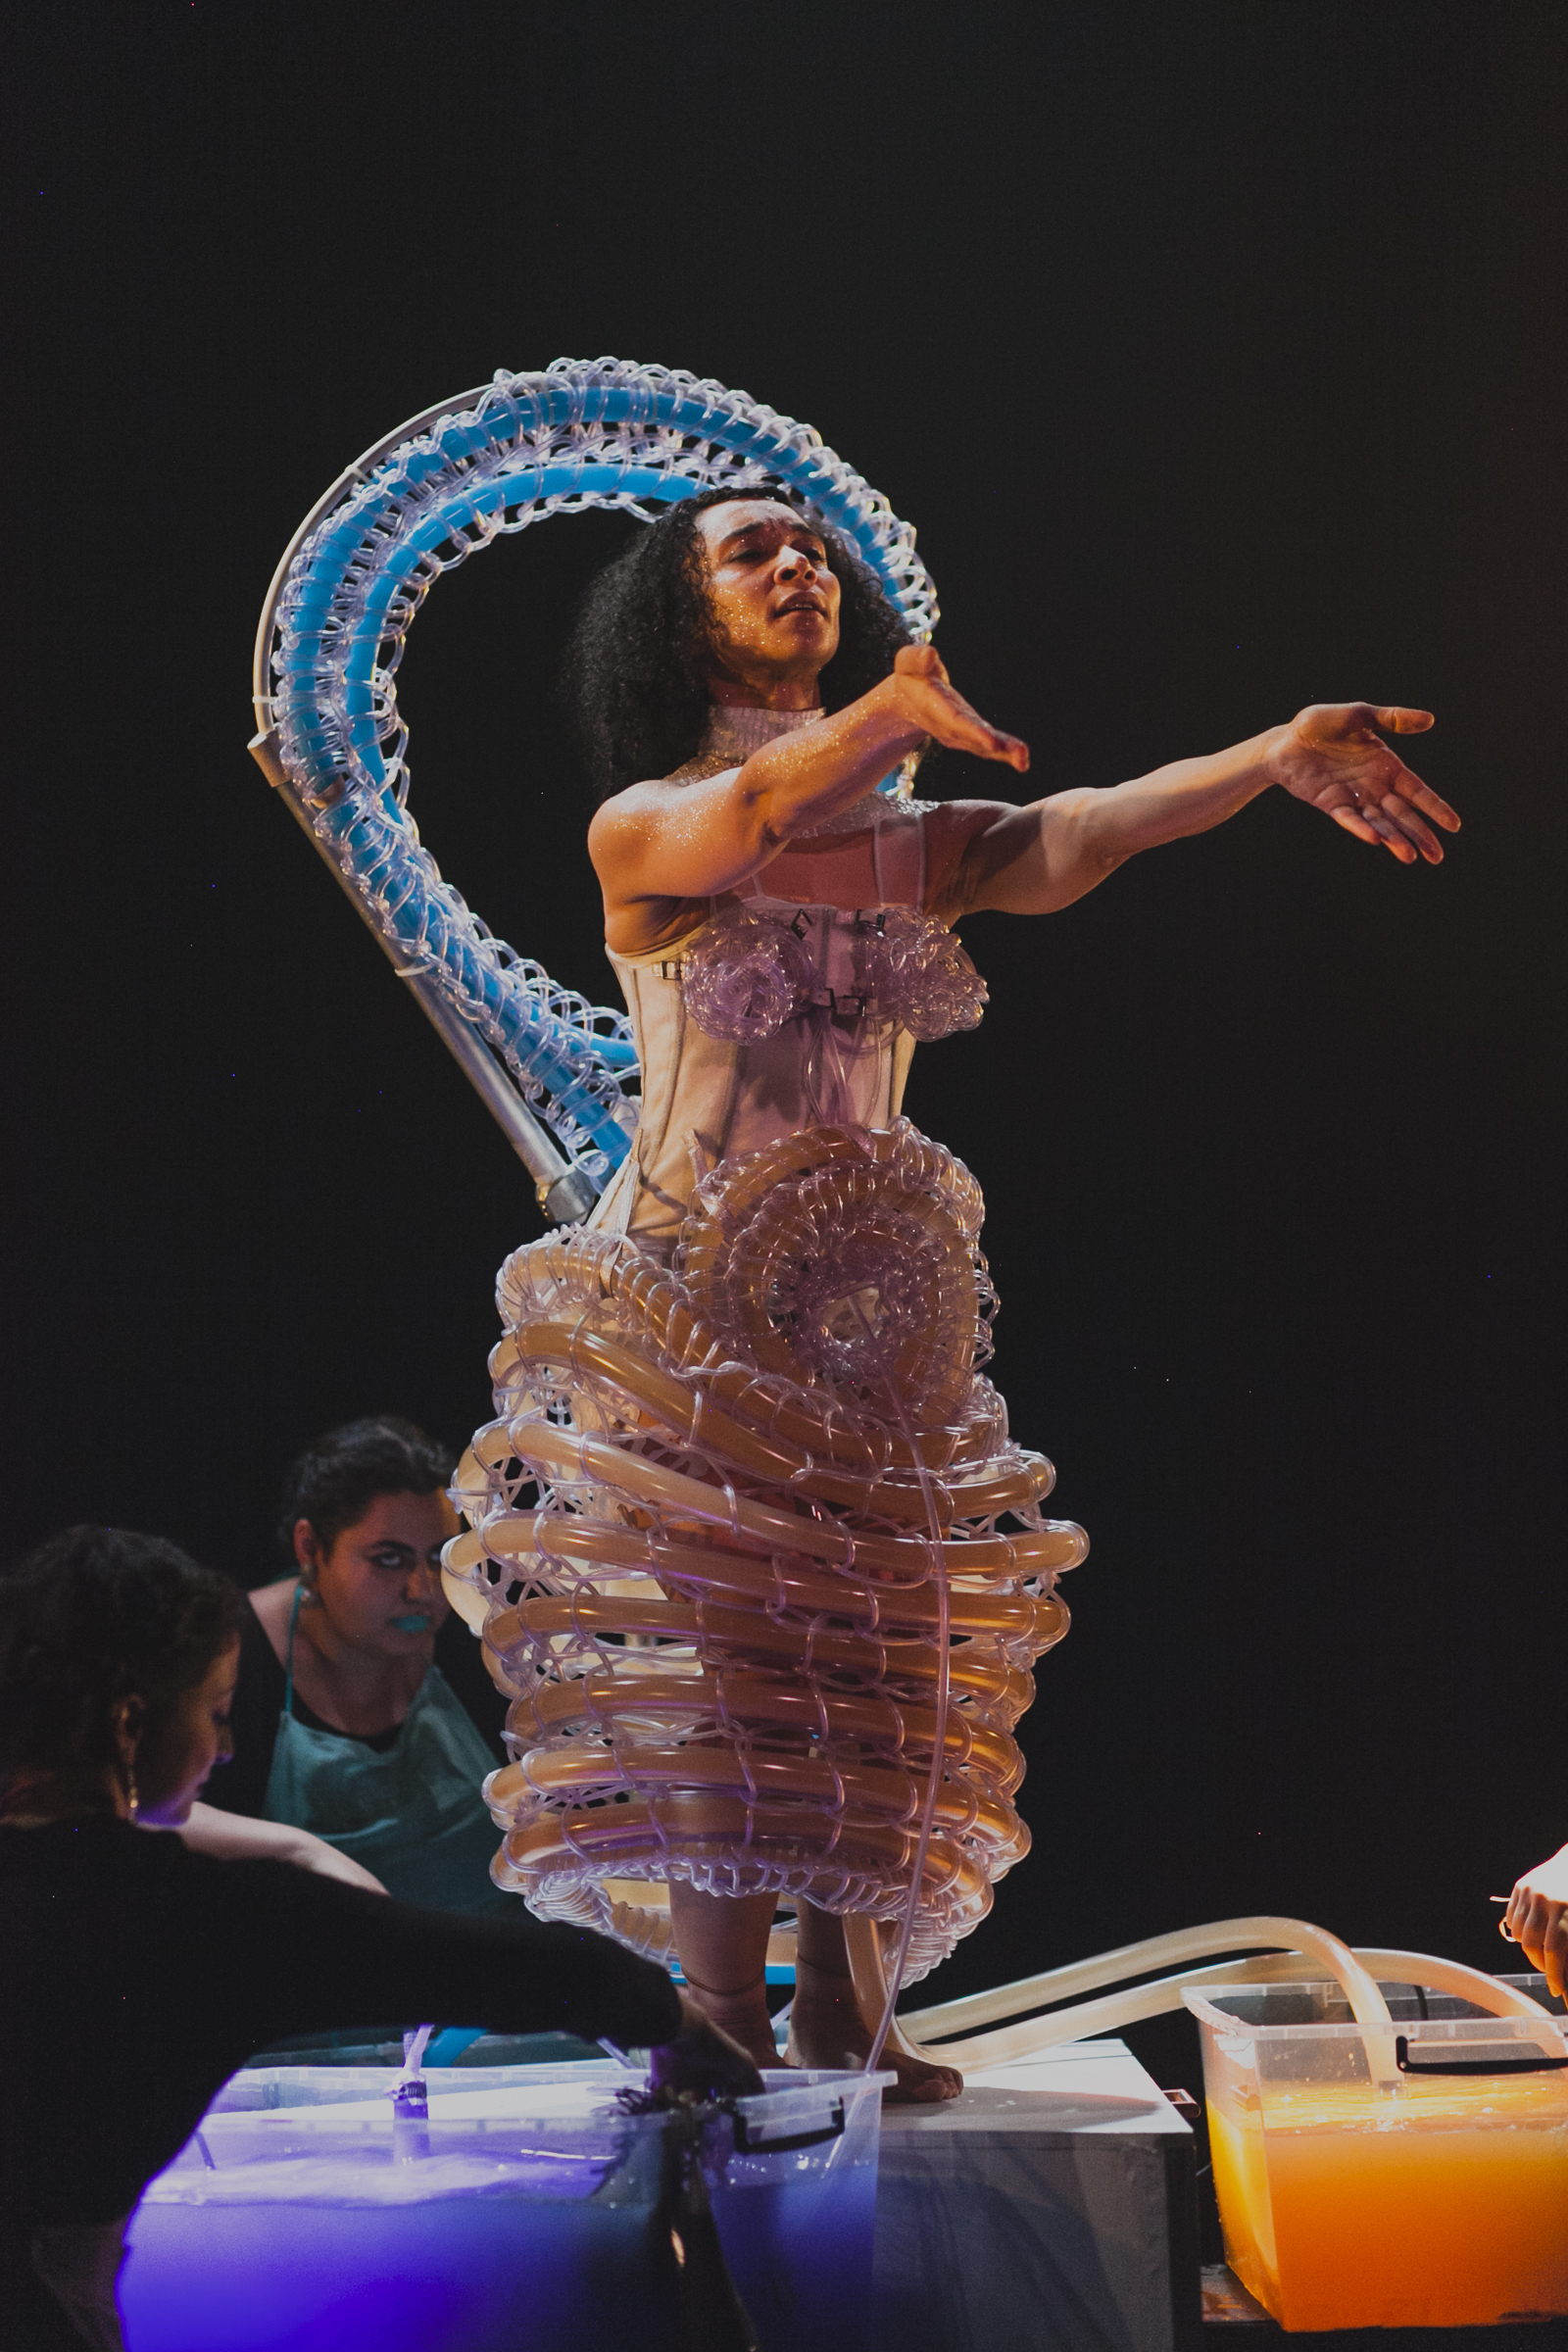 LCFMA19-CostumeShow-GabrielaLotaif-51.jpg